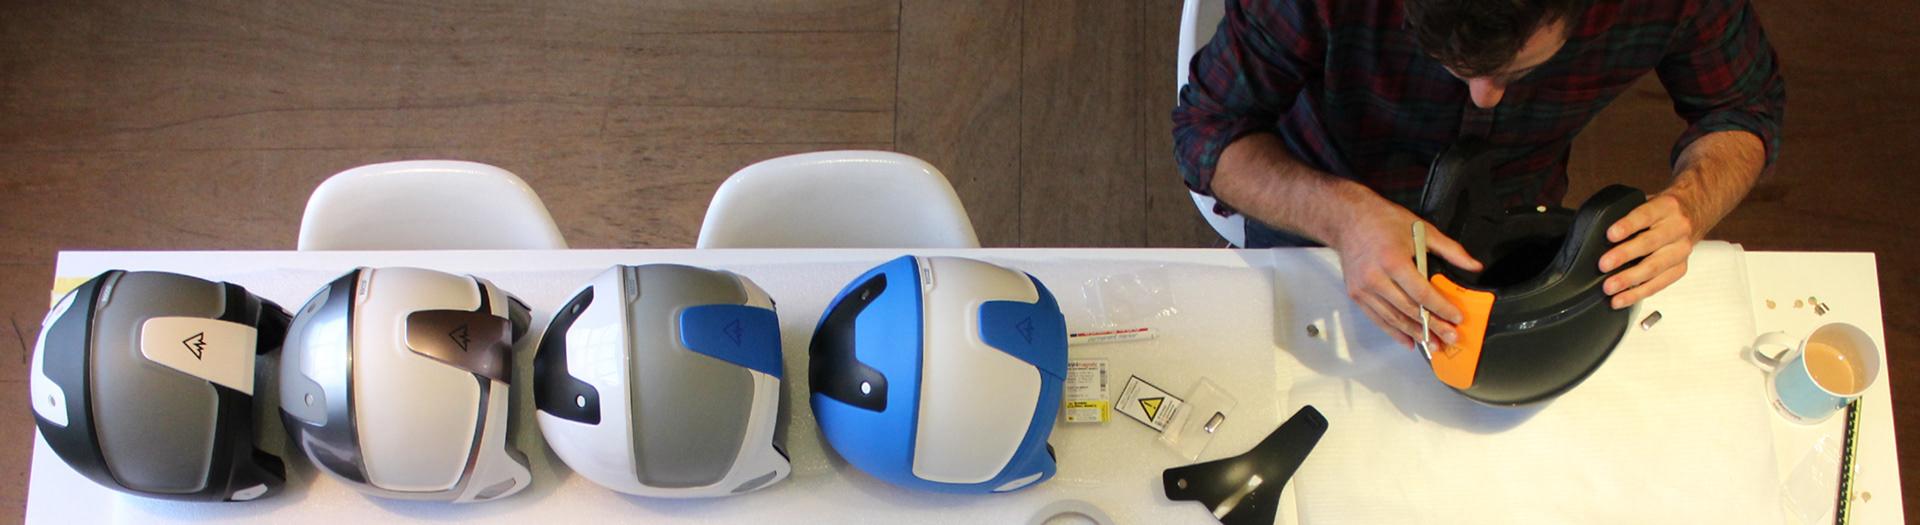 Curventa - prototyping - model making - helmets - link pro